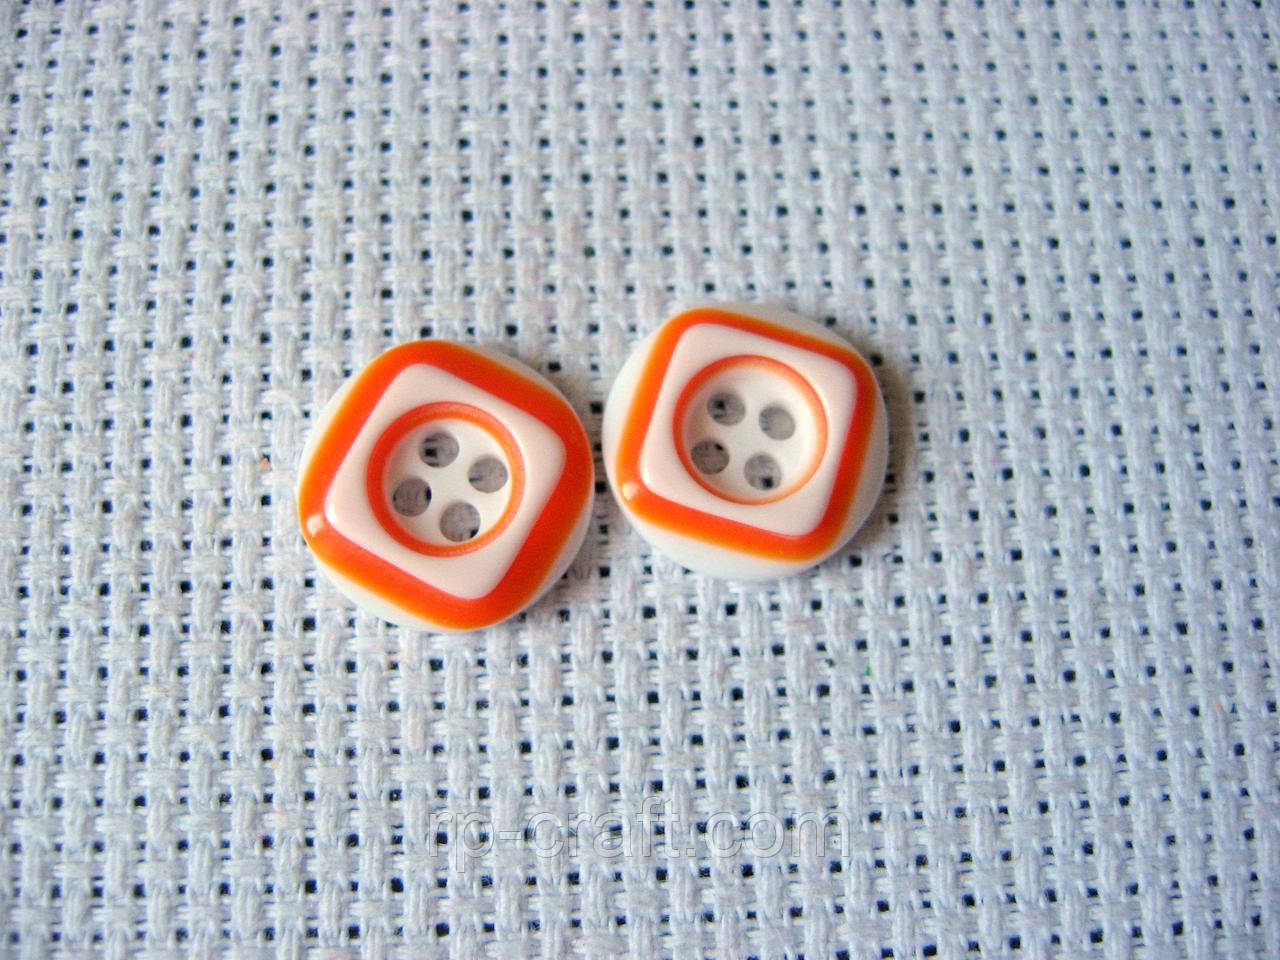 Пуговица пластиковая, декоративная, круглая. 12 мм, оранжевая